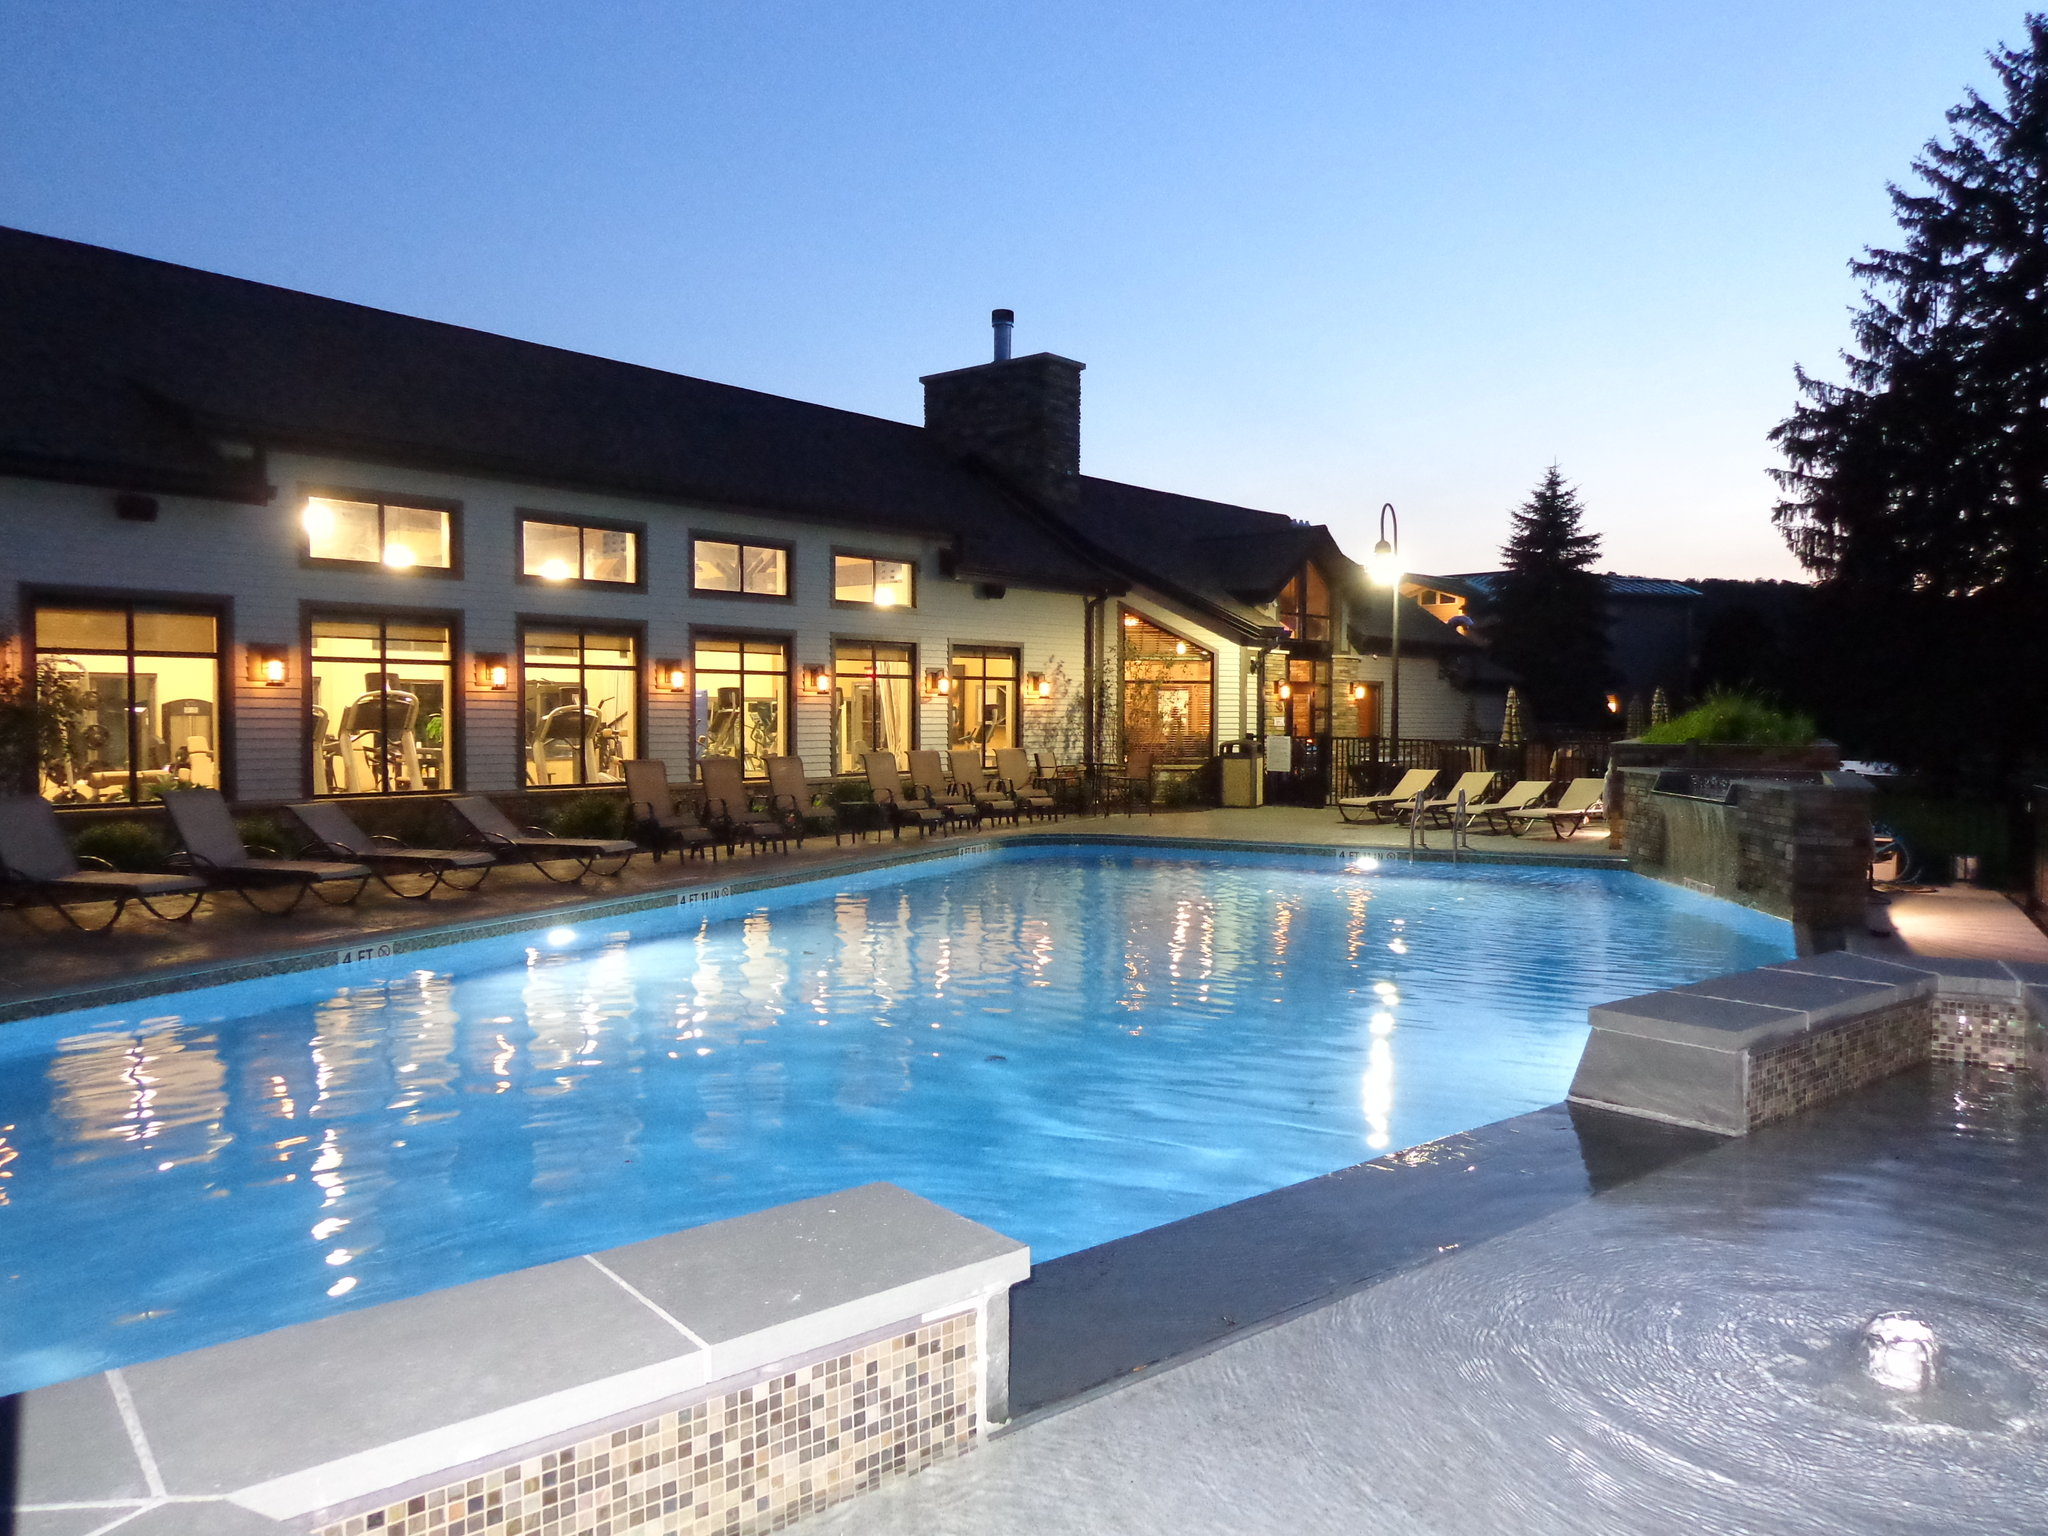 Pool View at Dusk